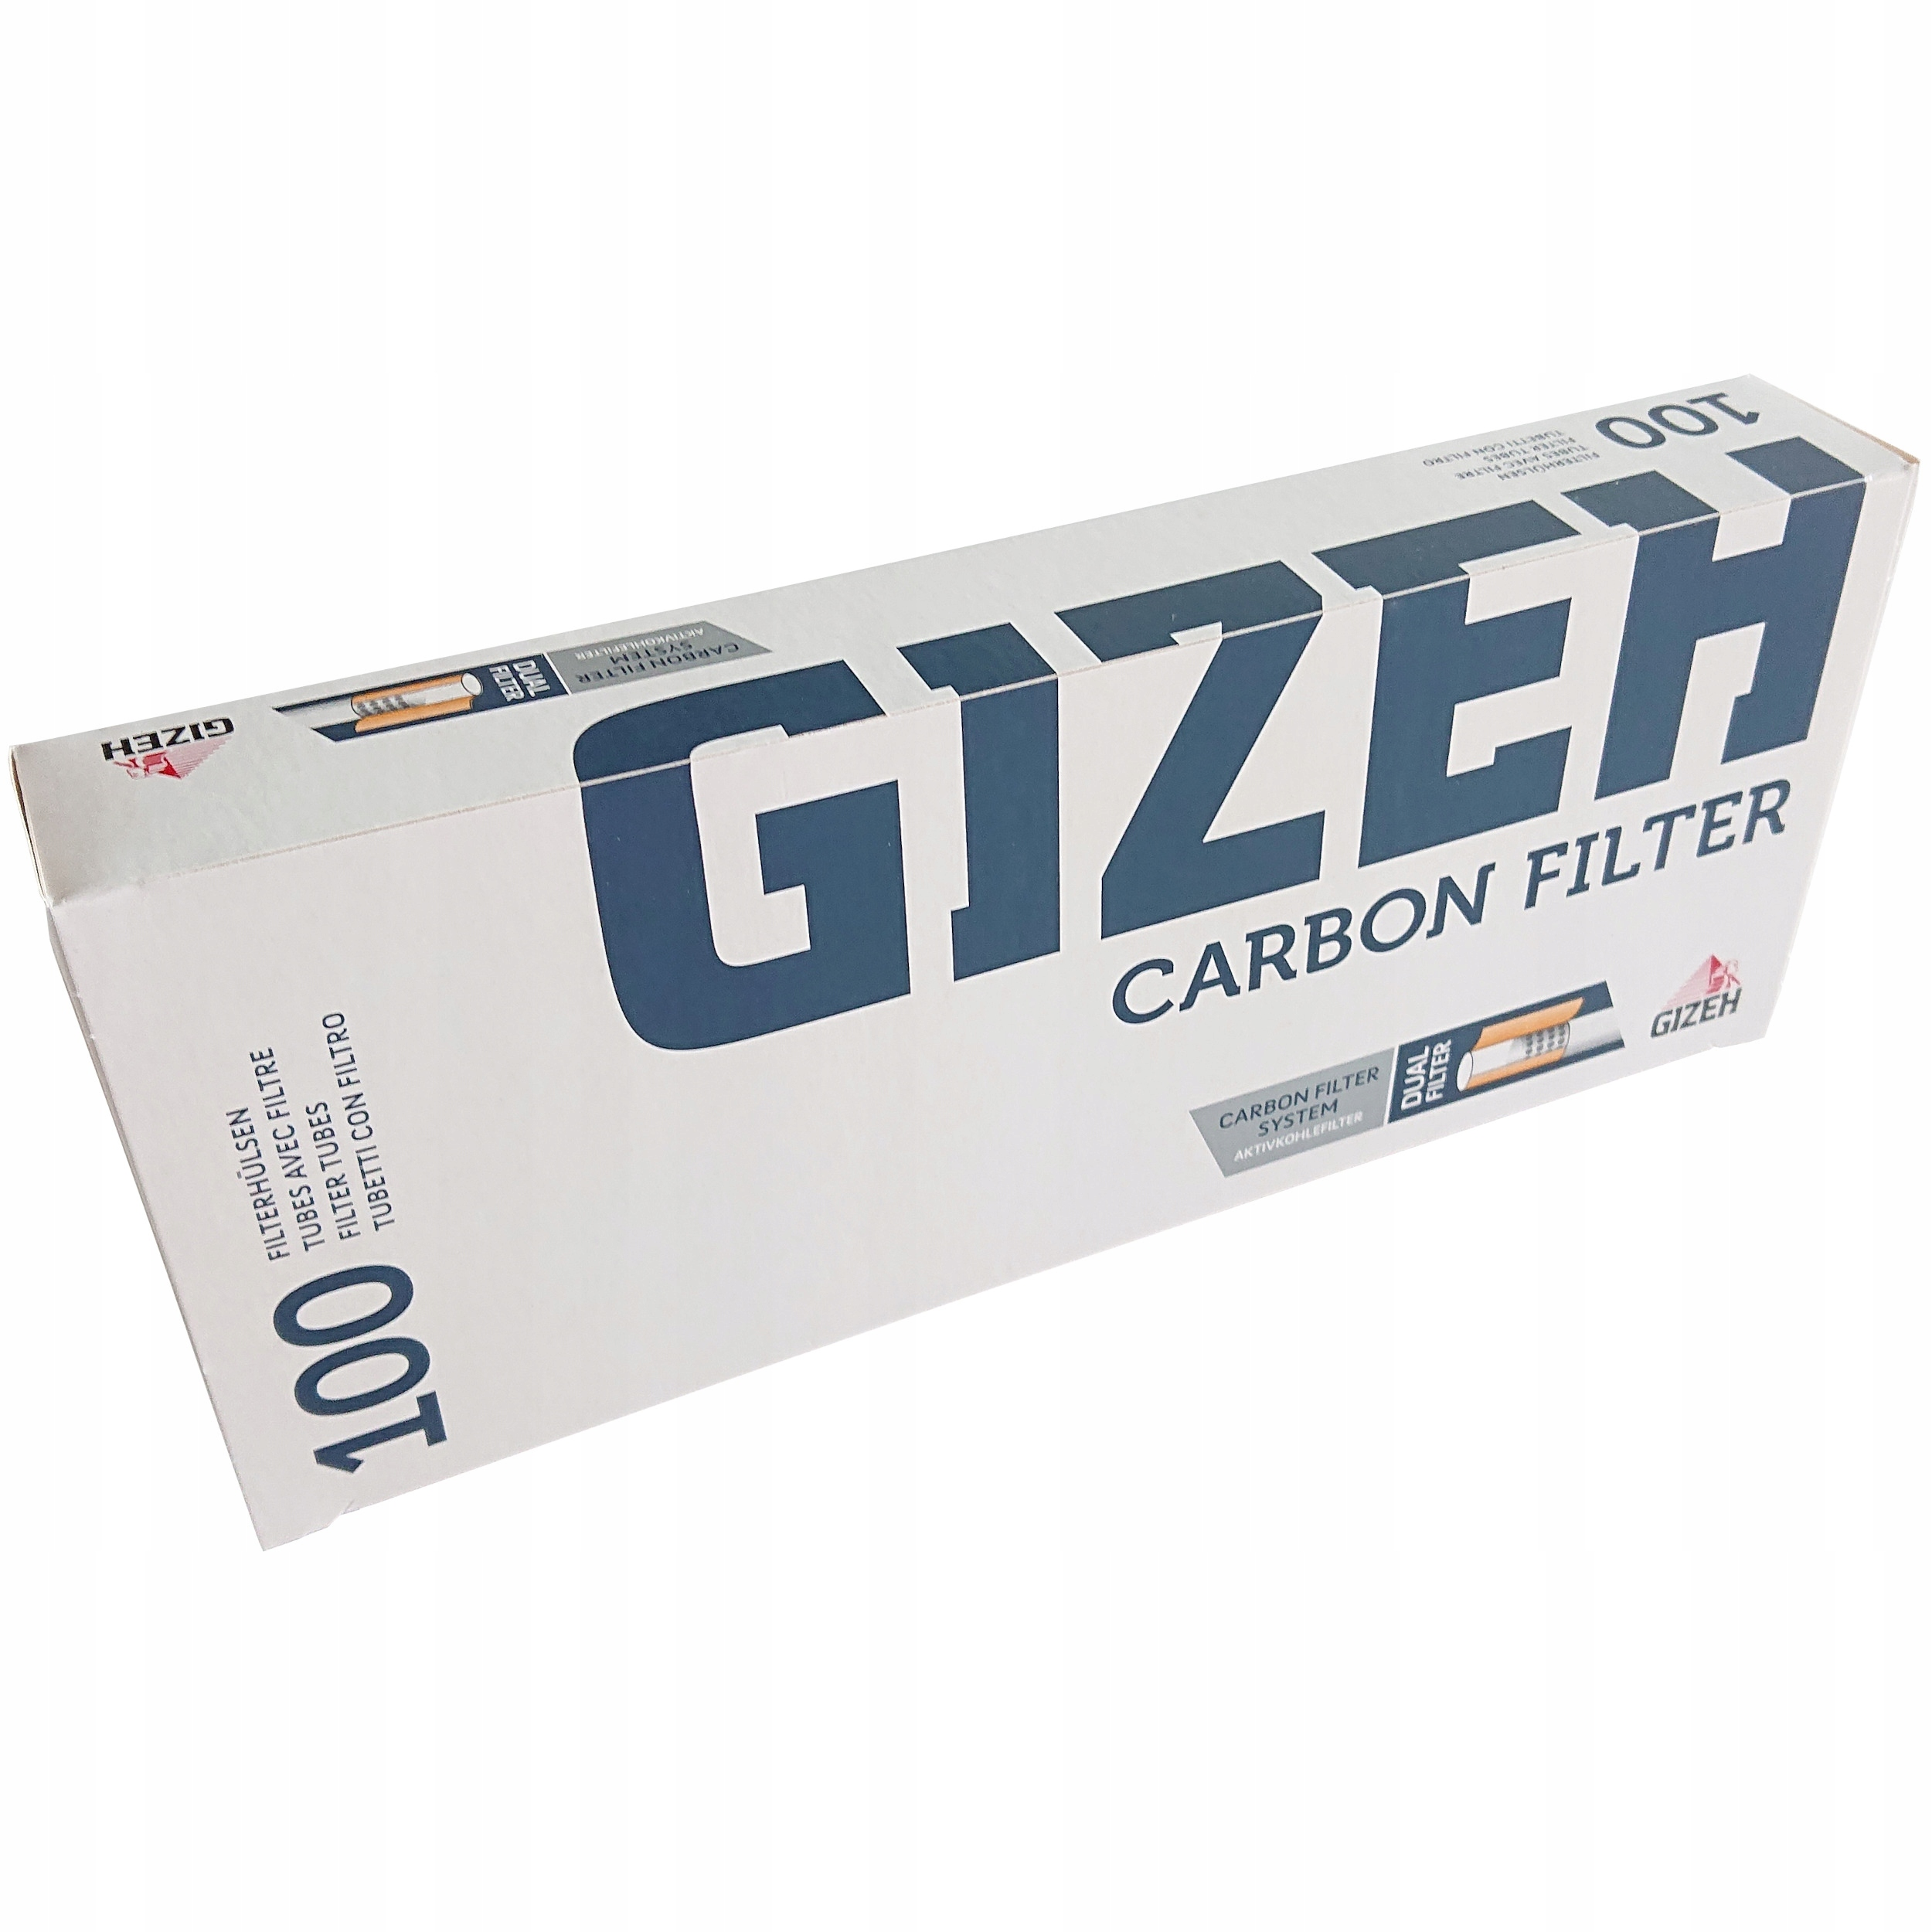 Сигаретные гильзы Gizeh Carbon 100 шт.